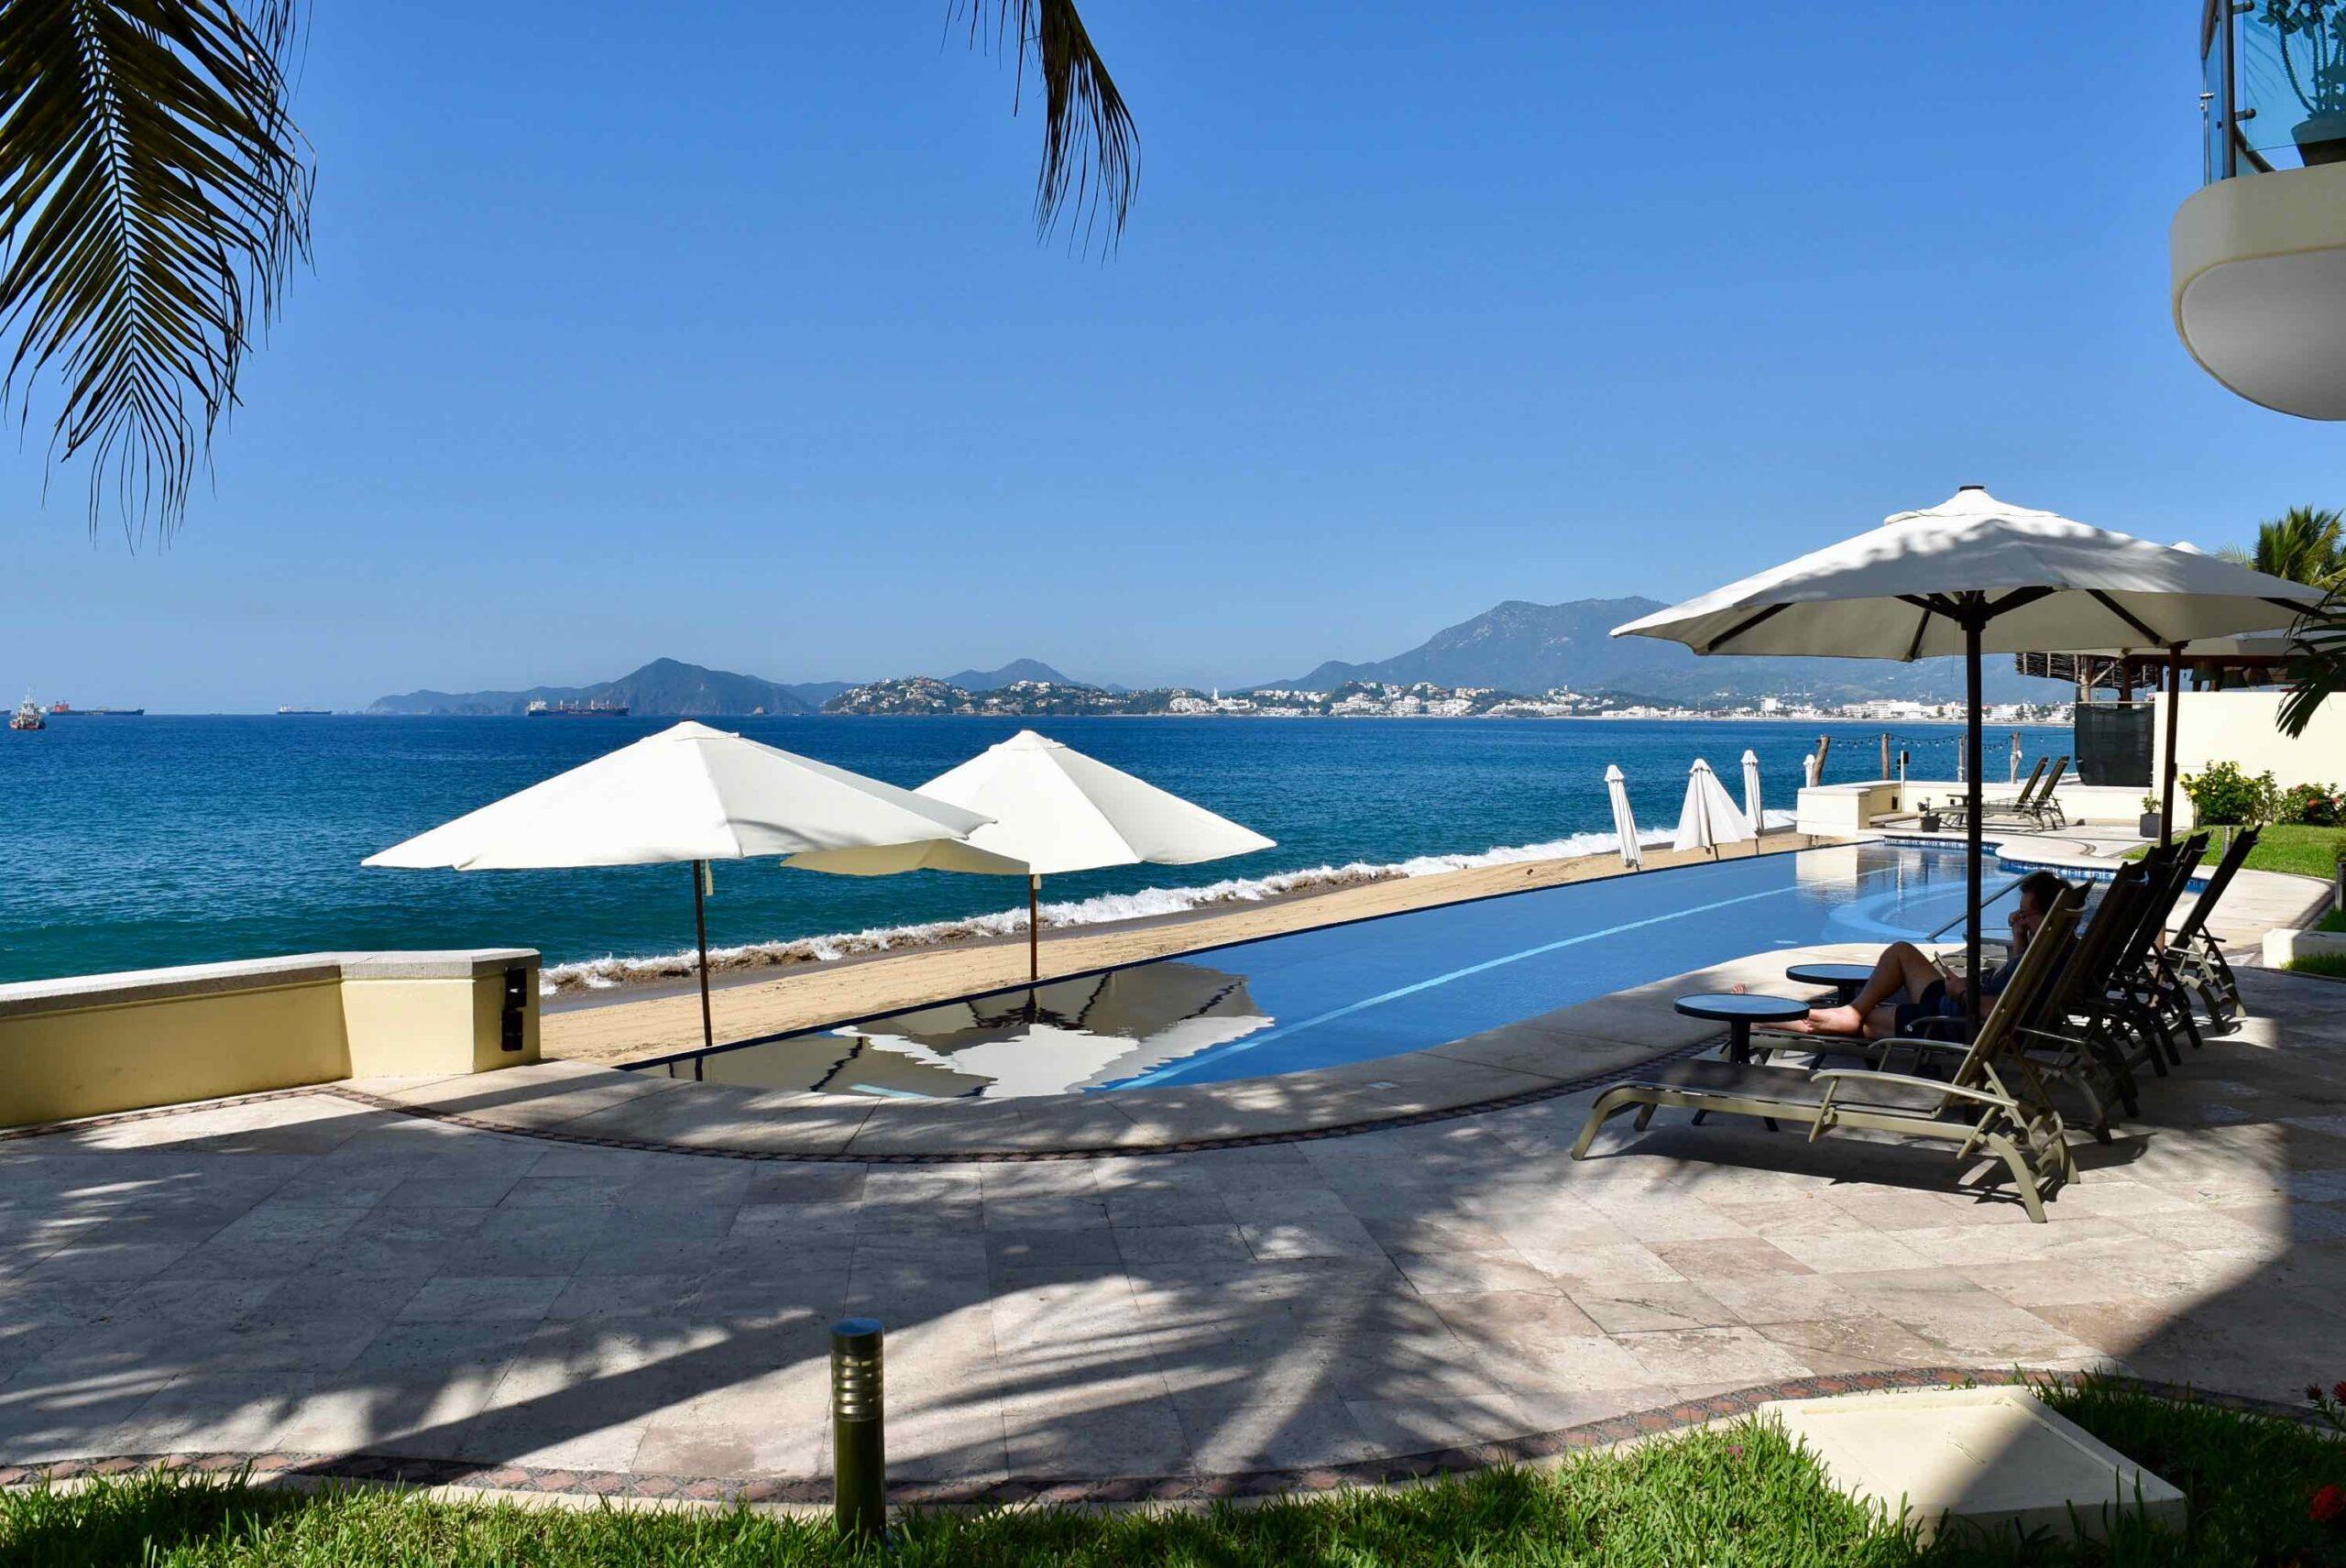 Oceanfront Perla del Mar condominium 202 for sale in Las Brisas community in Manzanillo, Mexico.